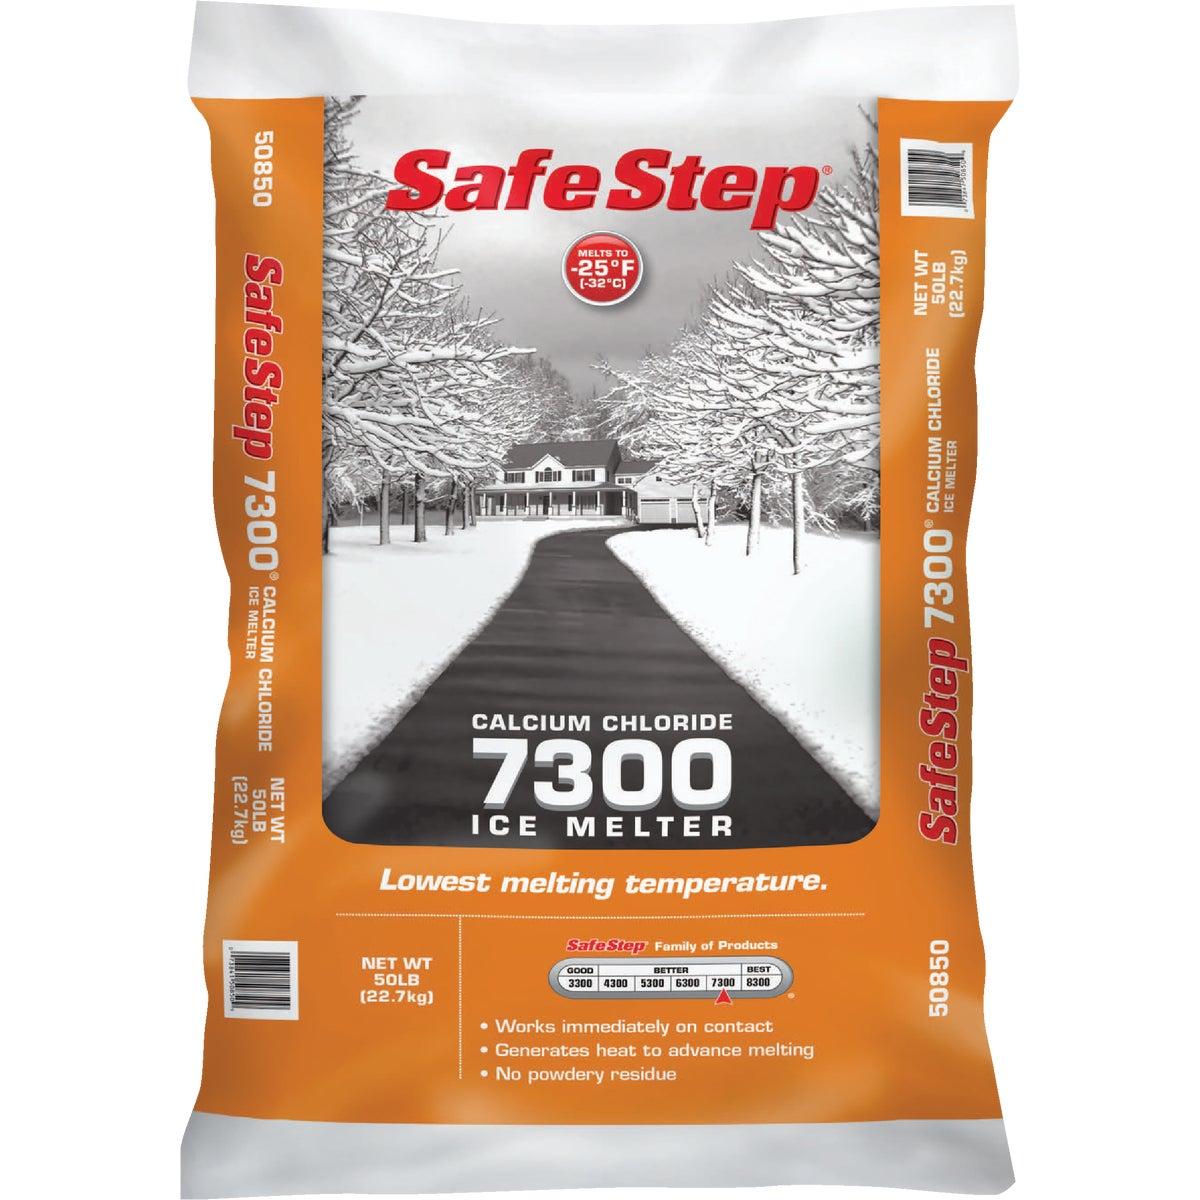 50LB 7300 CALC CHLORIDE - 50850T by North American Salt